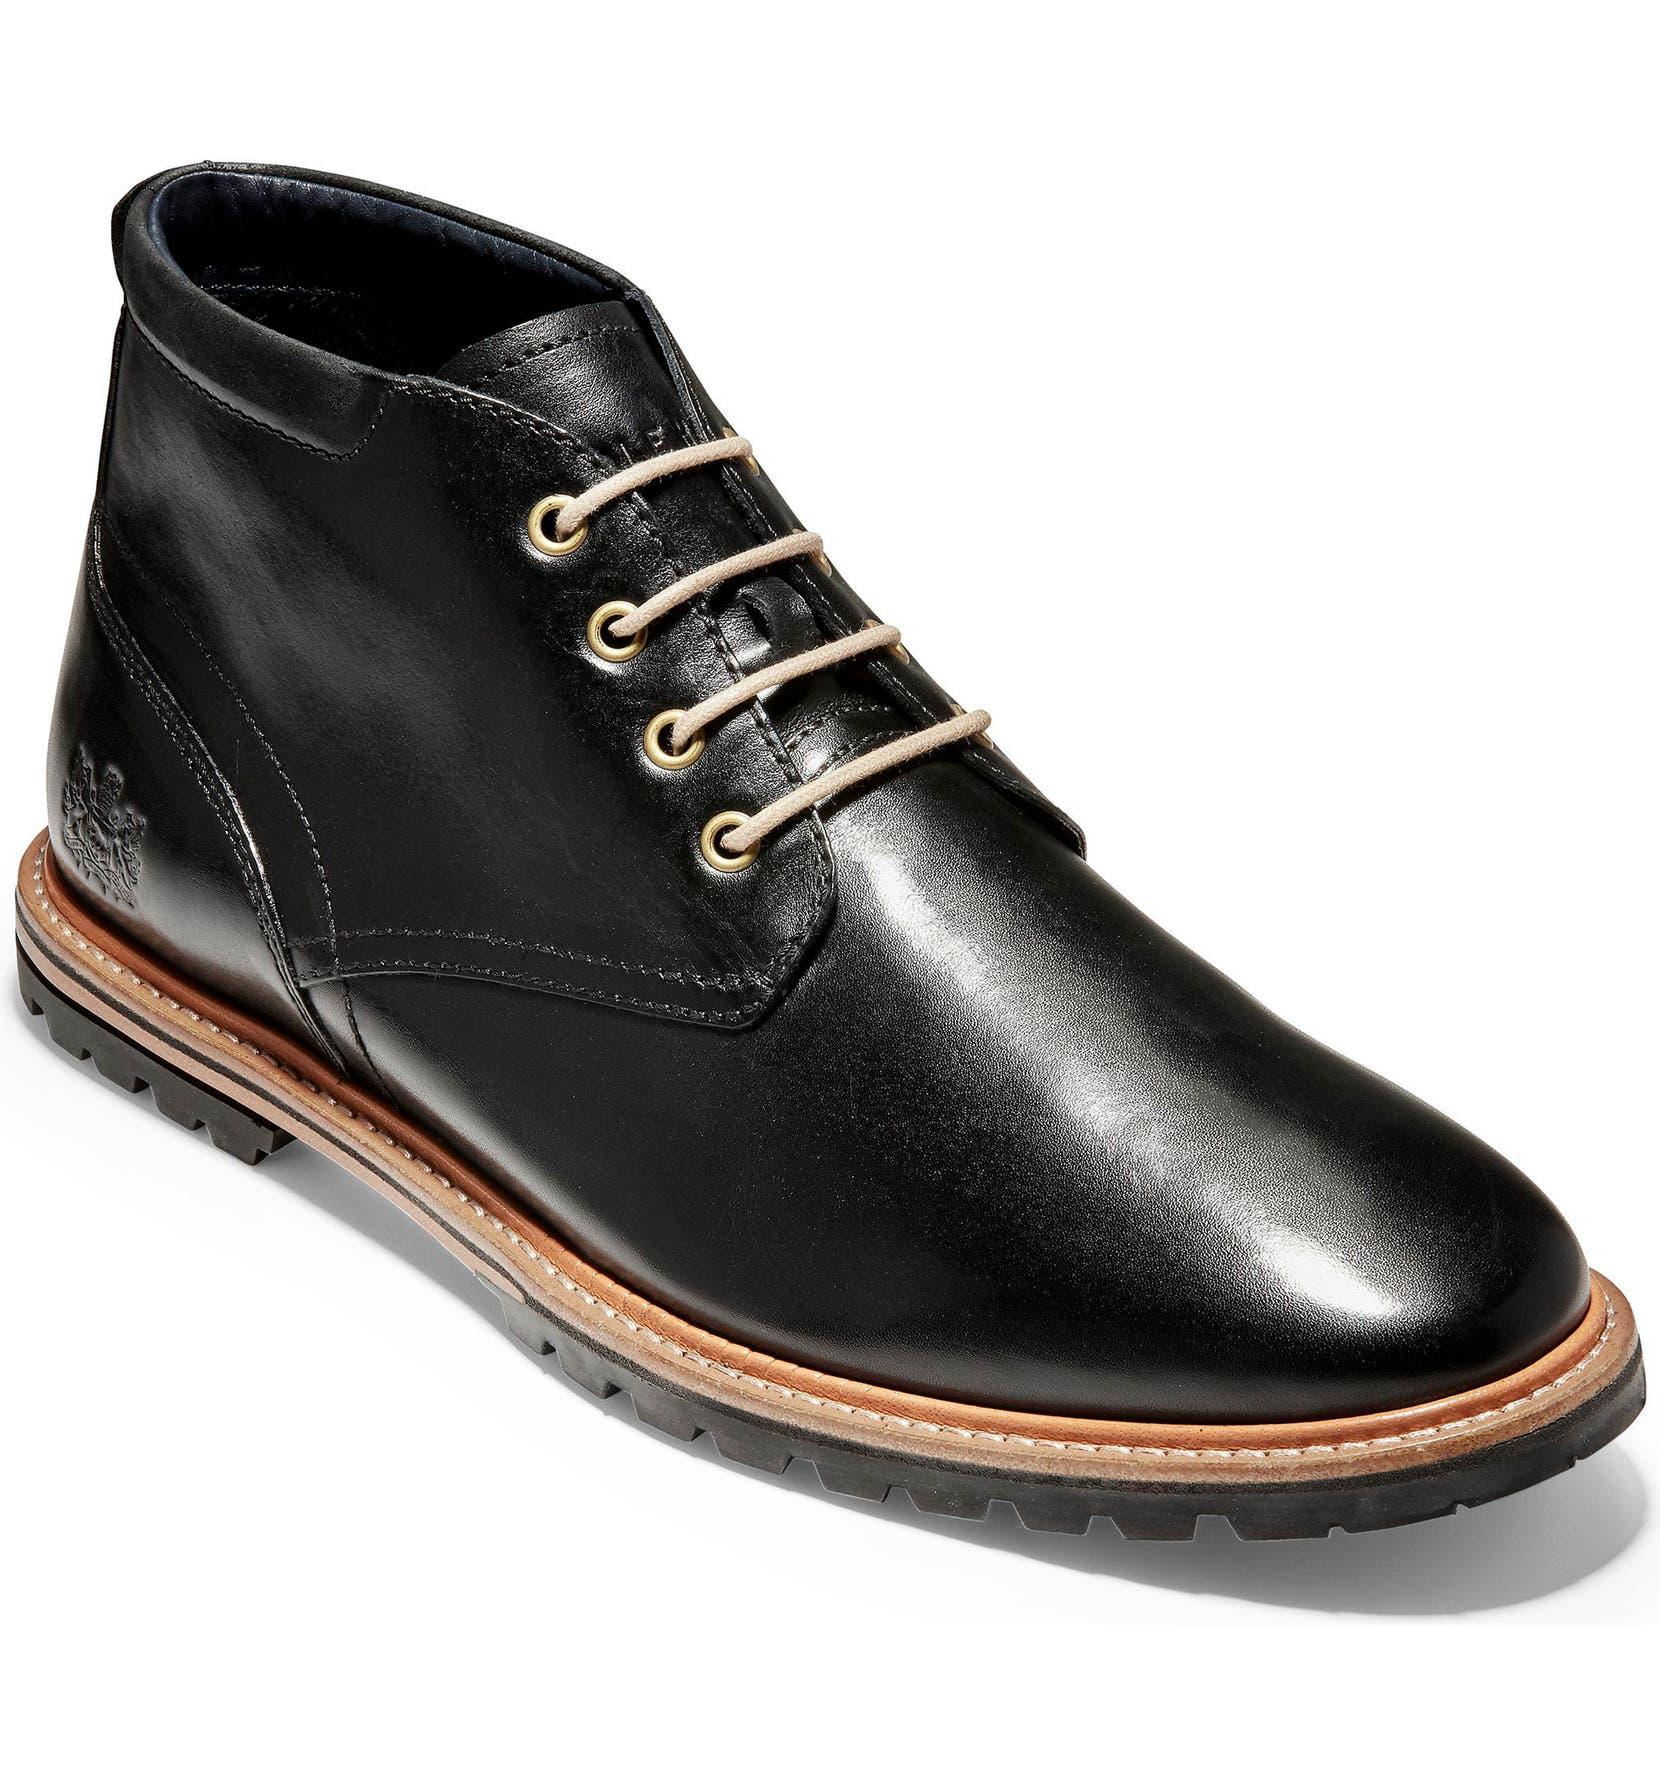 9f7fa46e0f0 Raymond Grand Water Resistant Chukka Boot